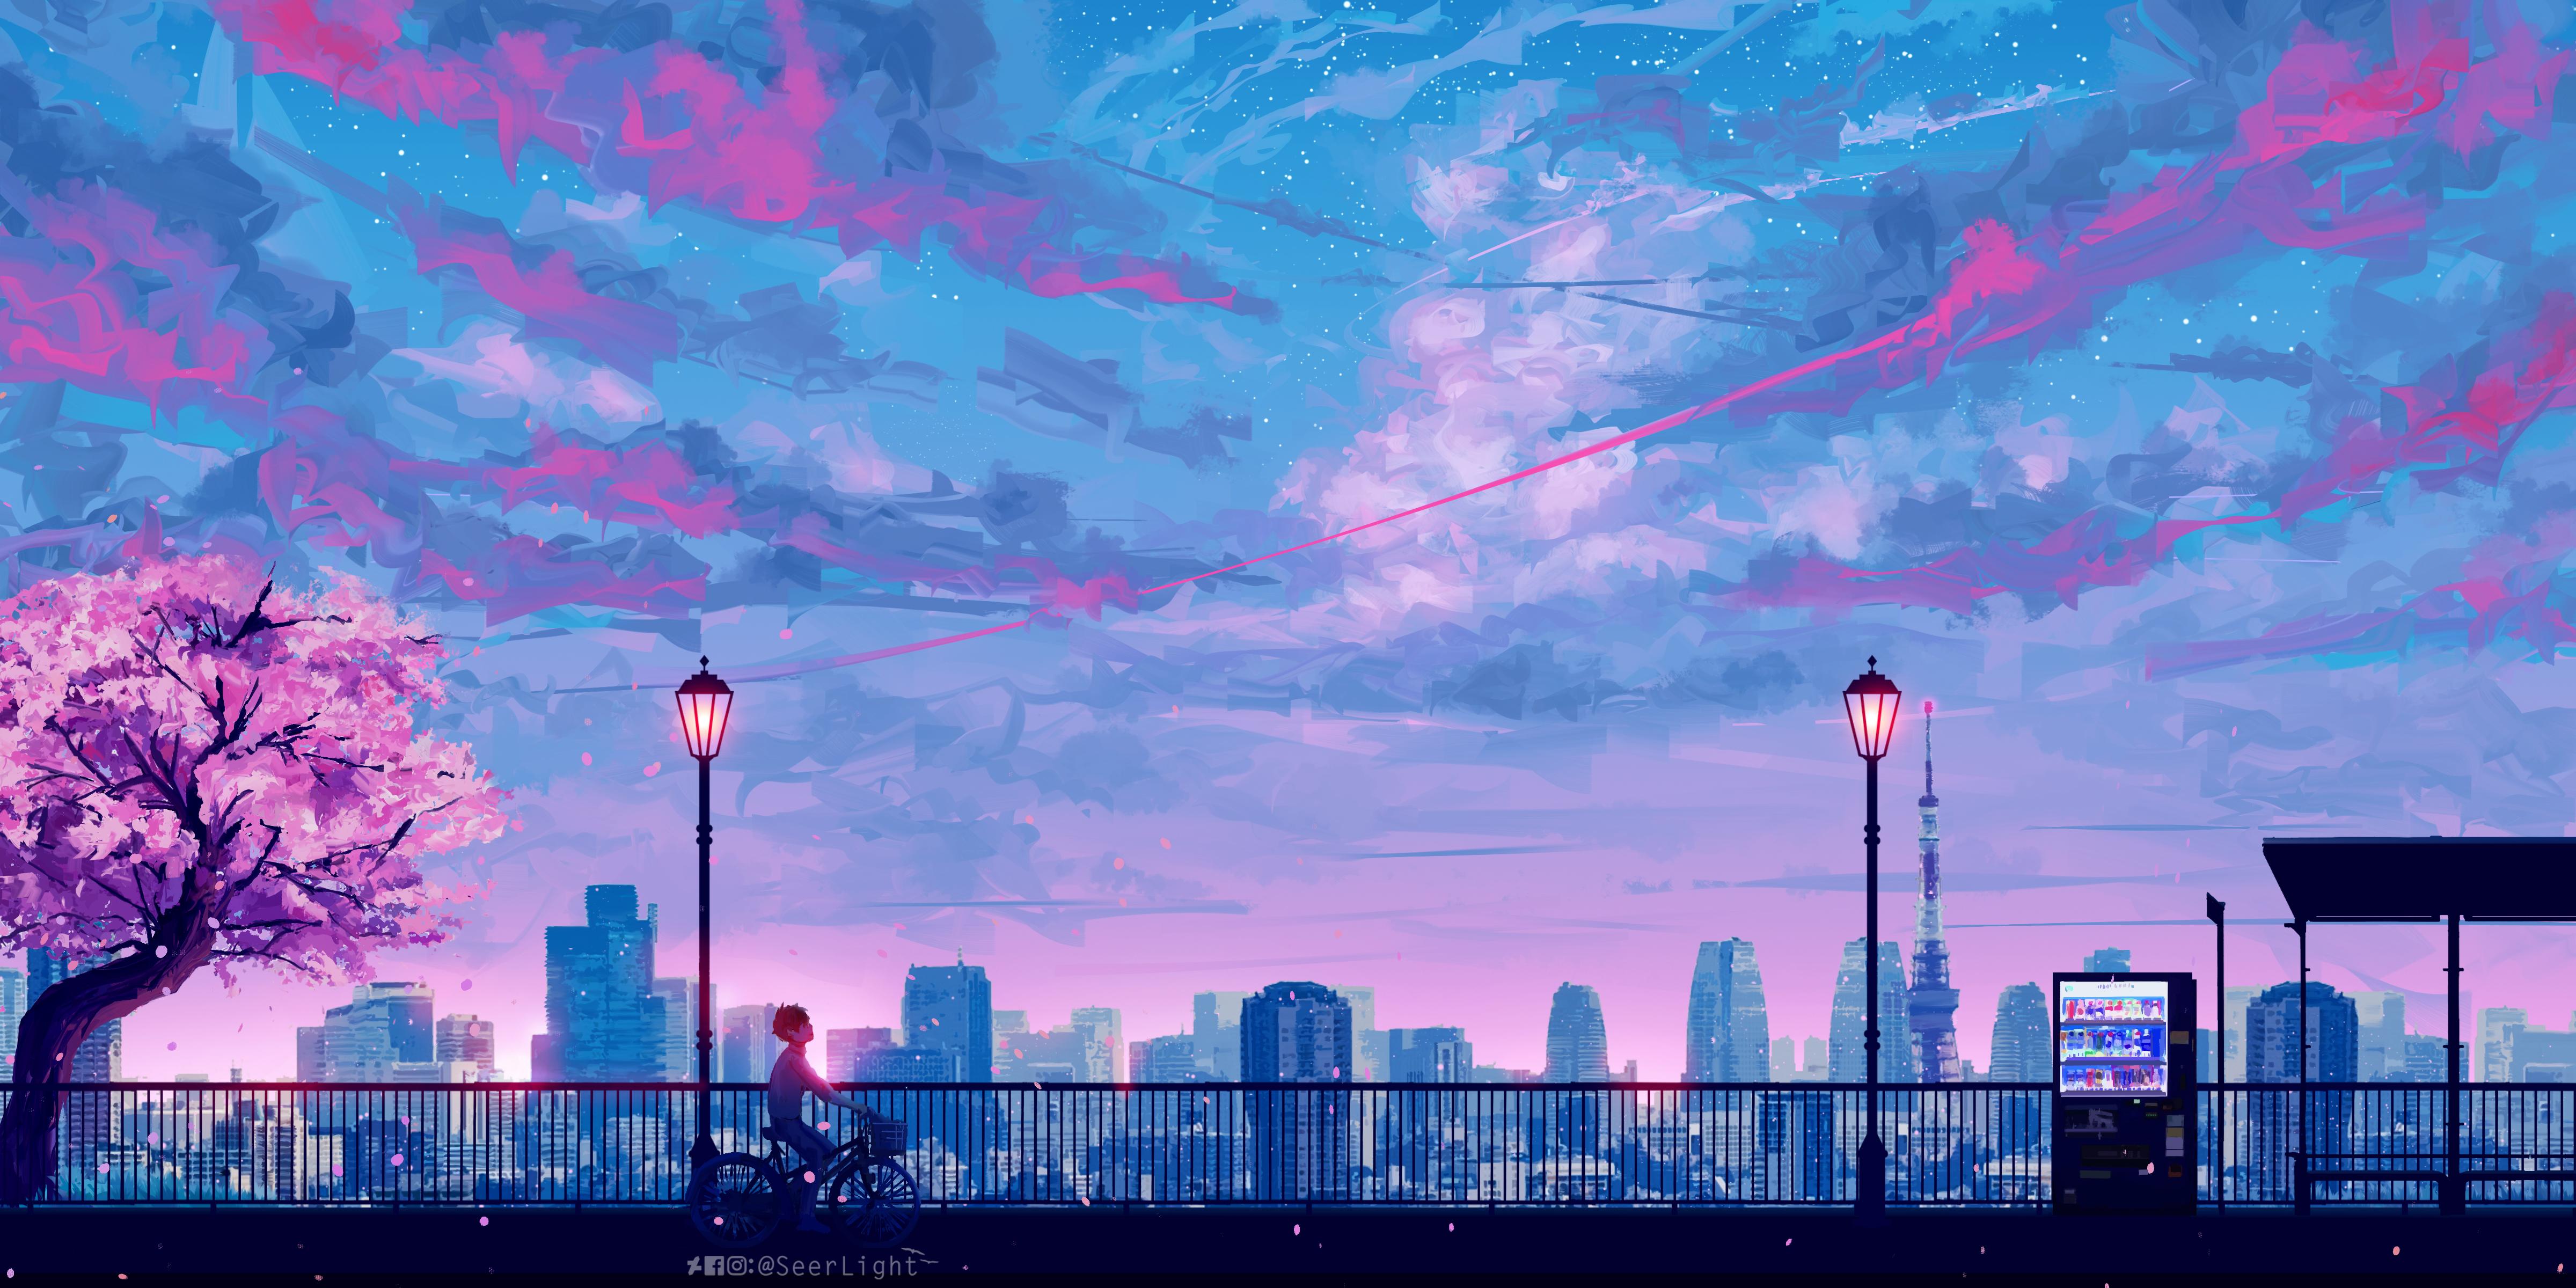 Anime cityscape landscape scenery 5k hd anime 4k - Anime scenery wallpaper laptop ...